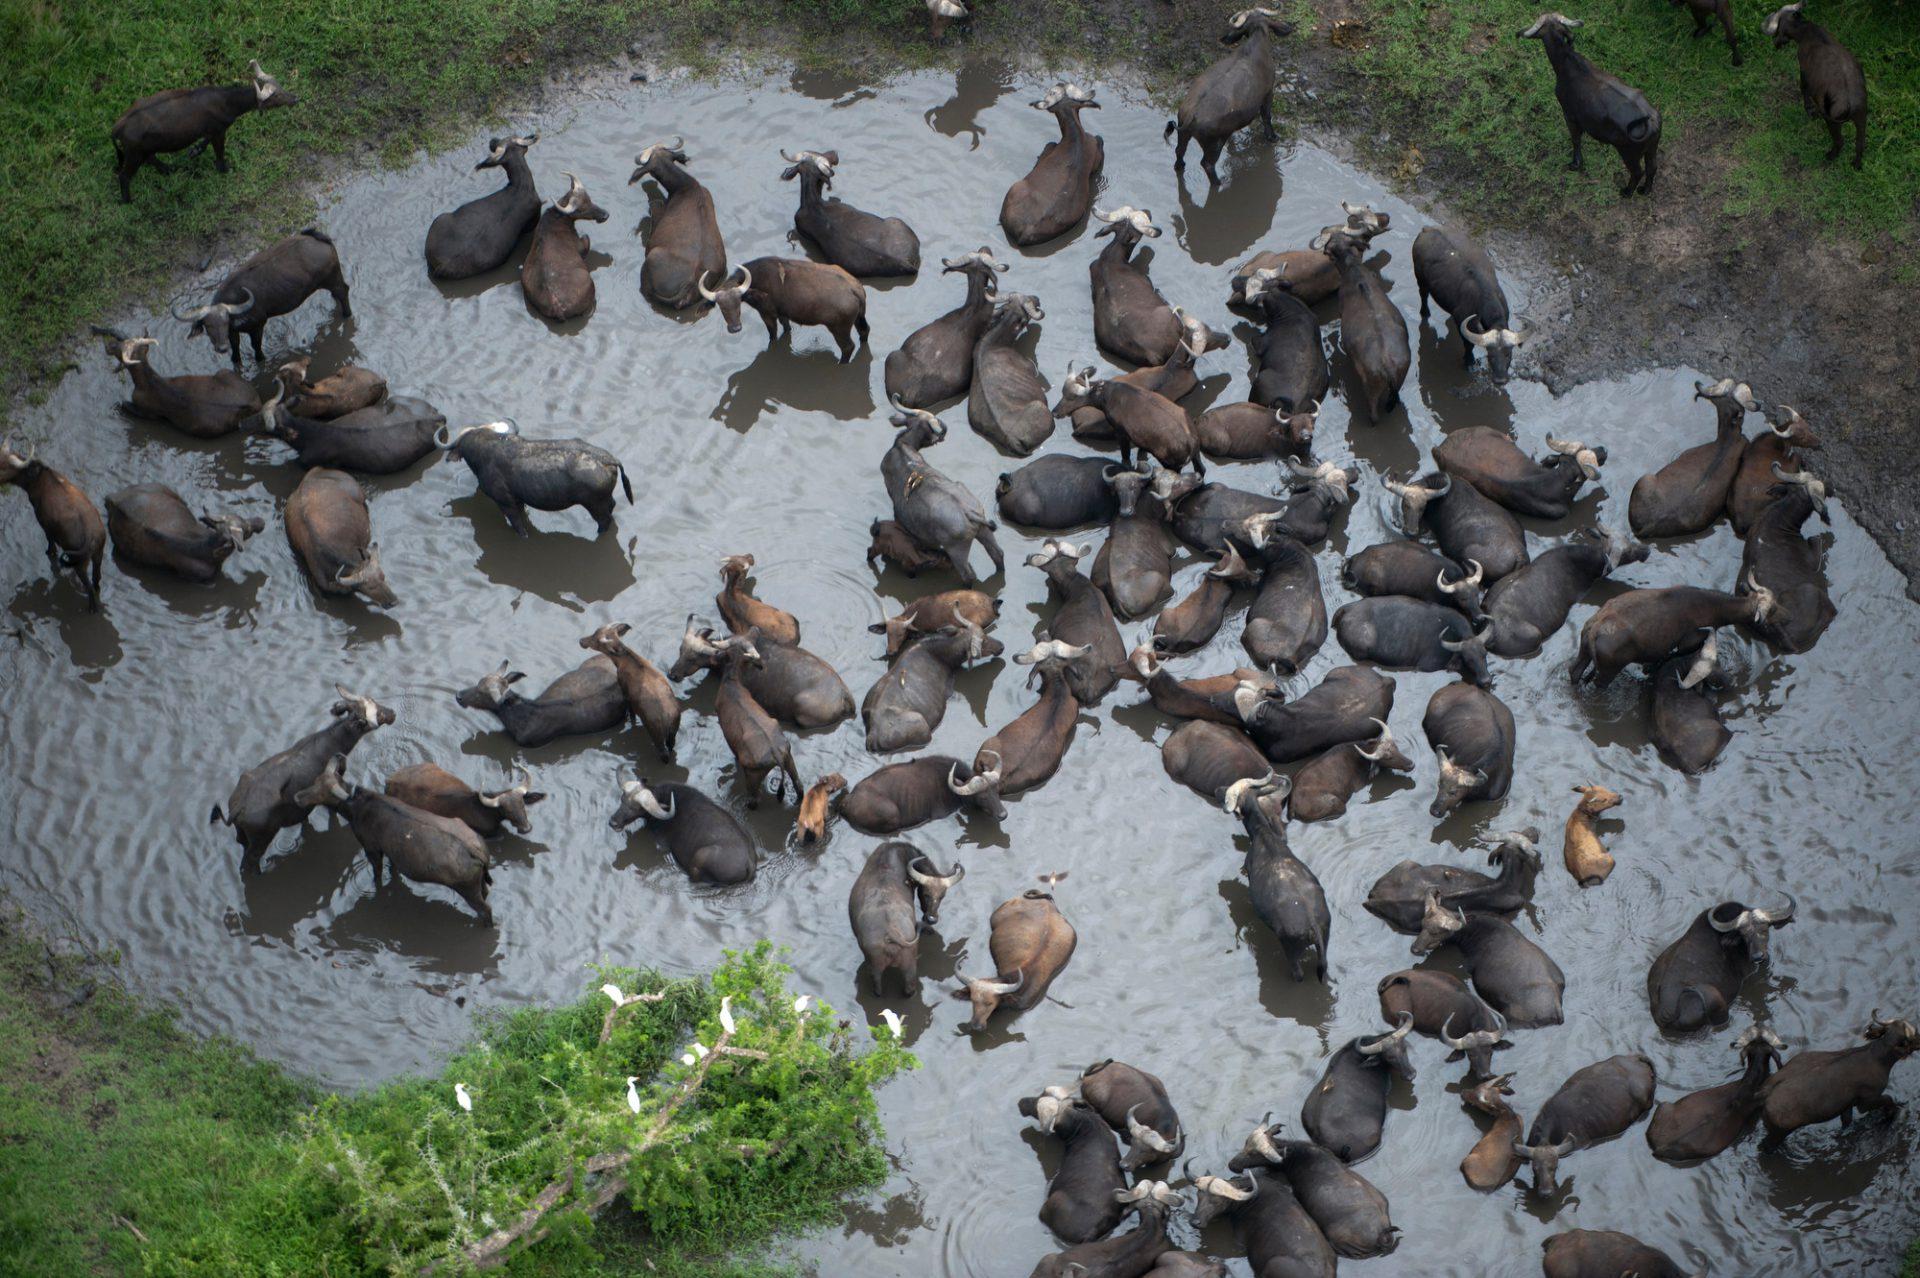 Photo: A water buffalo herd bathing in a water hole.